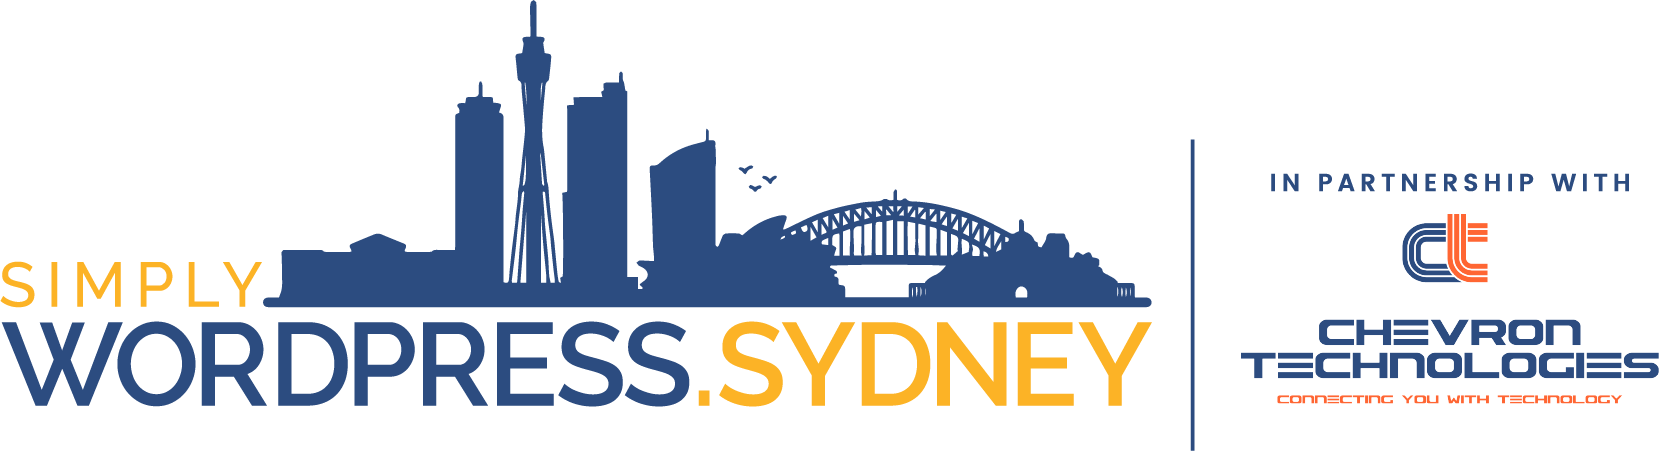 Chevron Technologies | simplywordpress.sydney